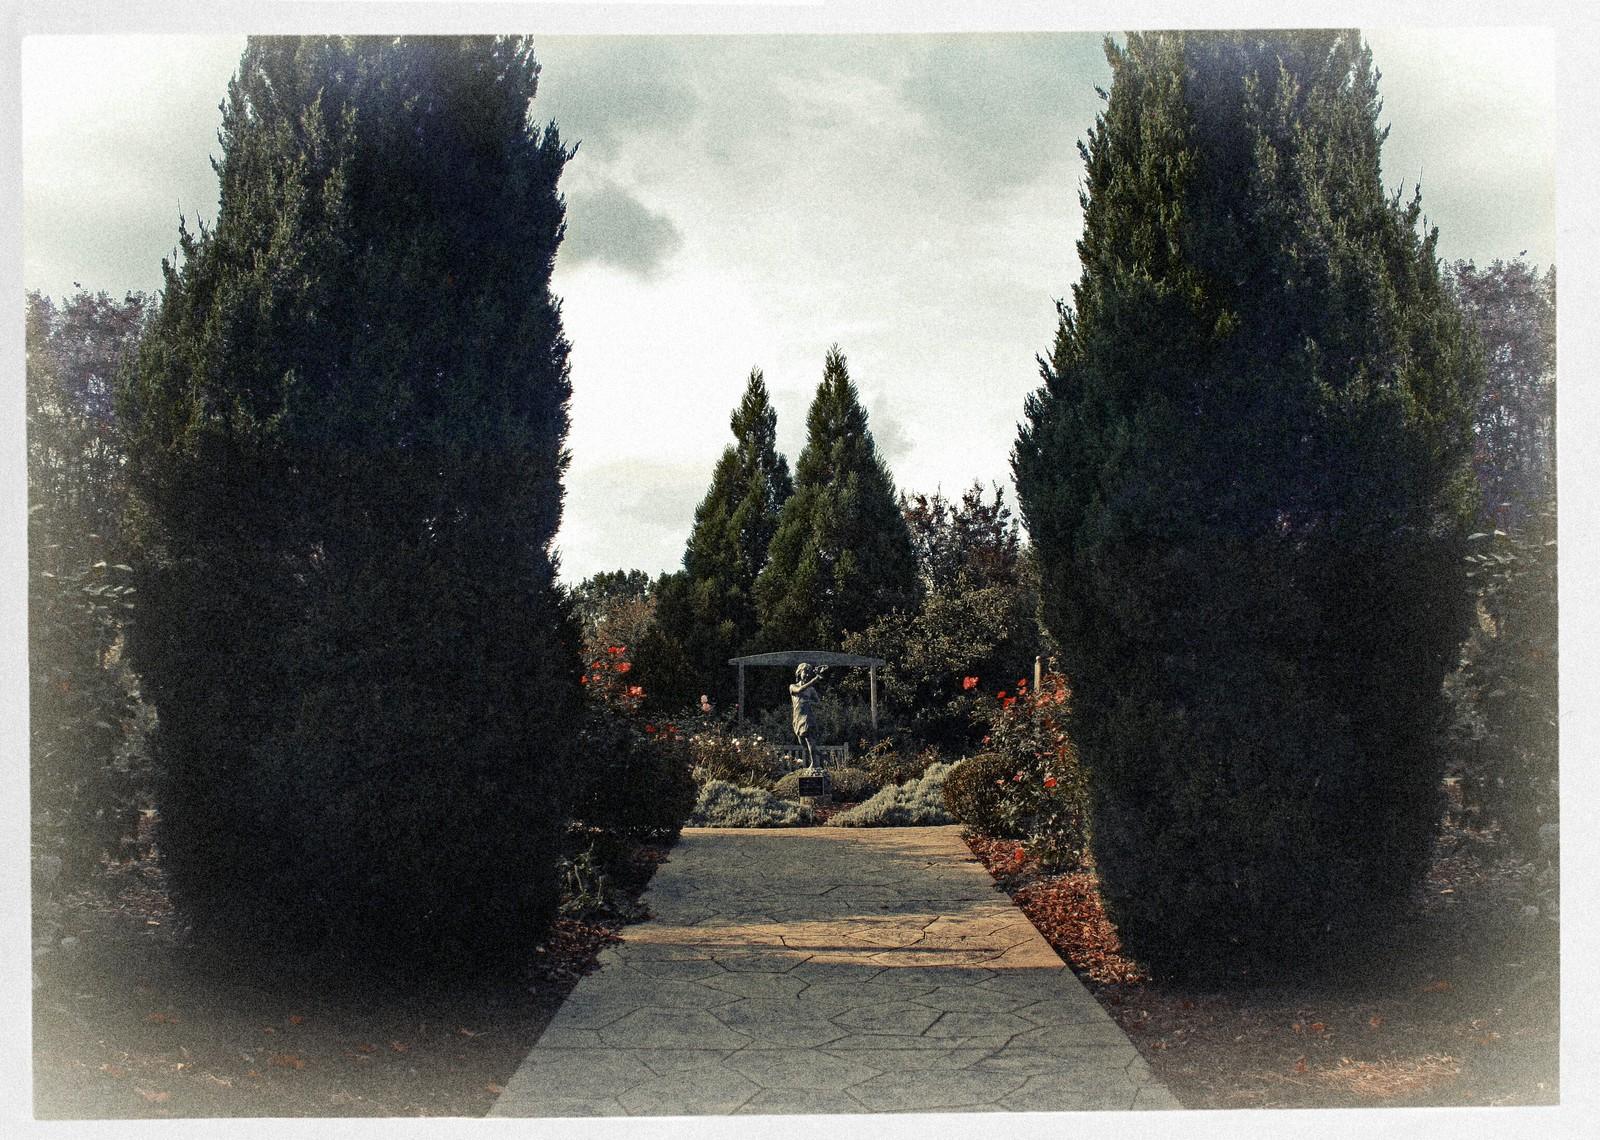 Entrance to the Rose Garden, Oct 2014